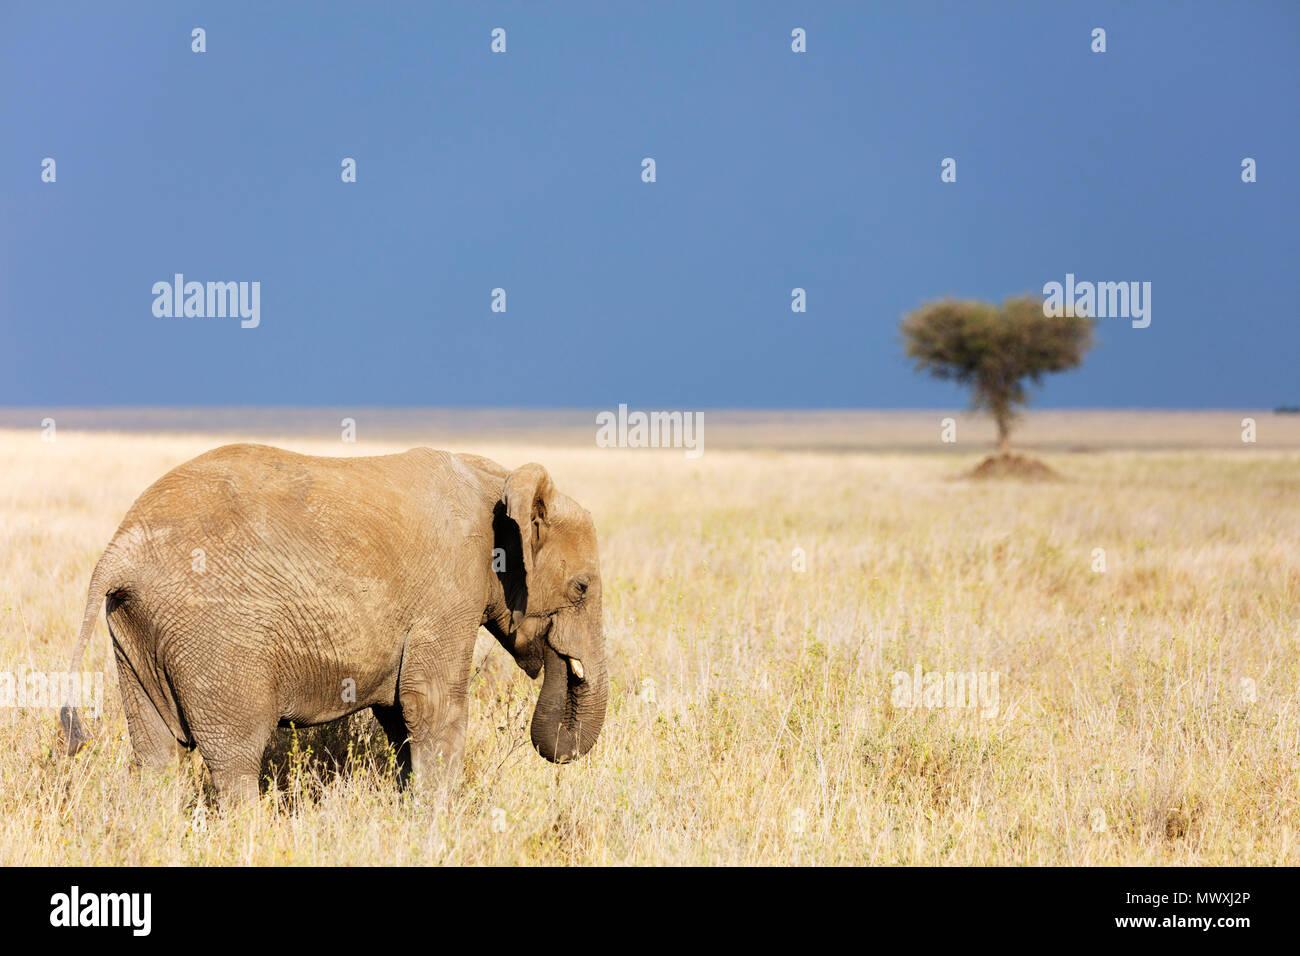 African elephant (Loxodonta africana), Serengeti National Park, UNESCO World Heritage Site, Tanzania, East Africa, Africa - Stock Image